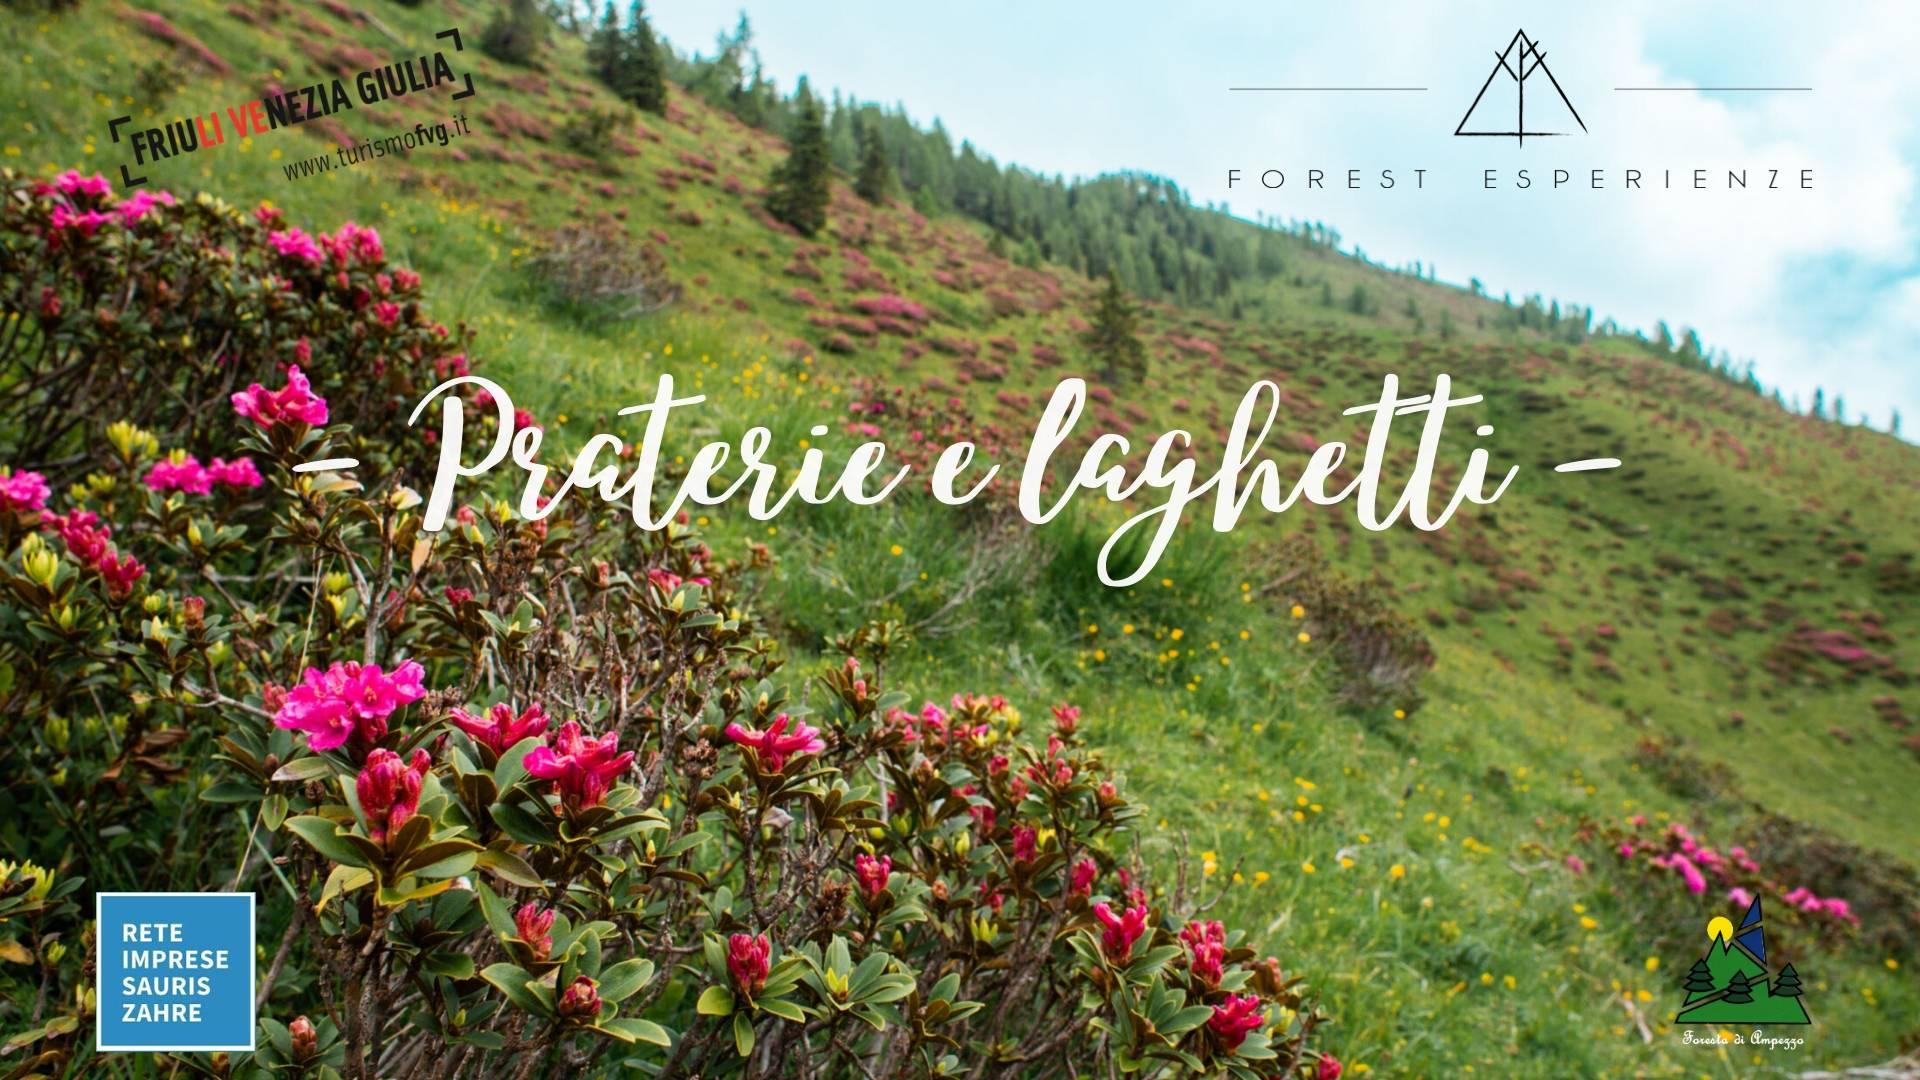 Praterie alpine e laghetti di Festons